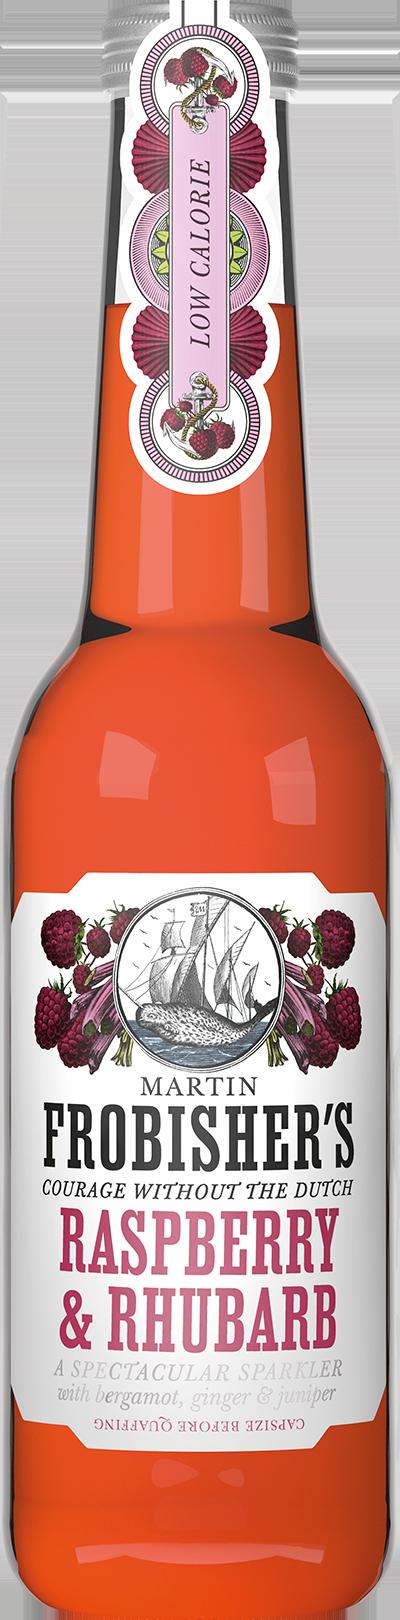 Raspberry & Rhubarb